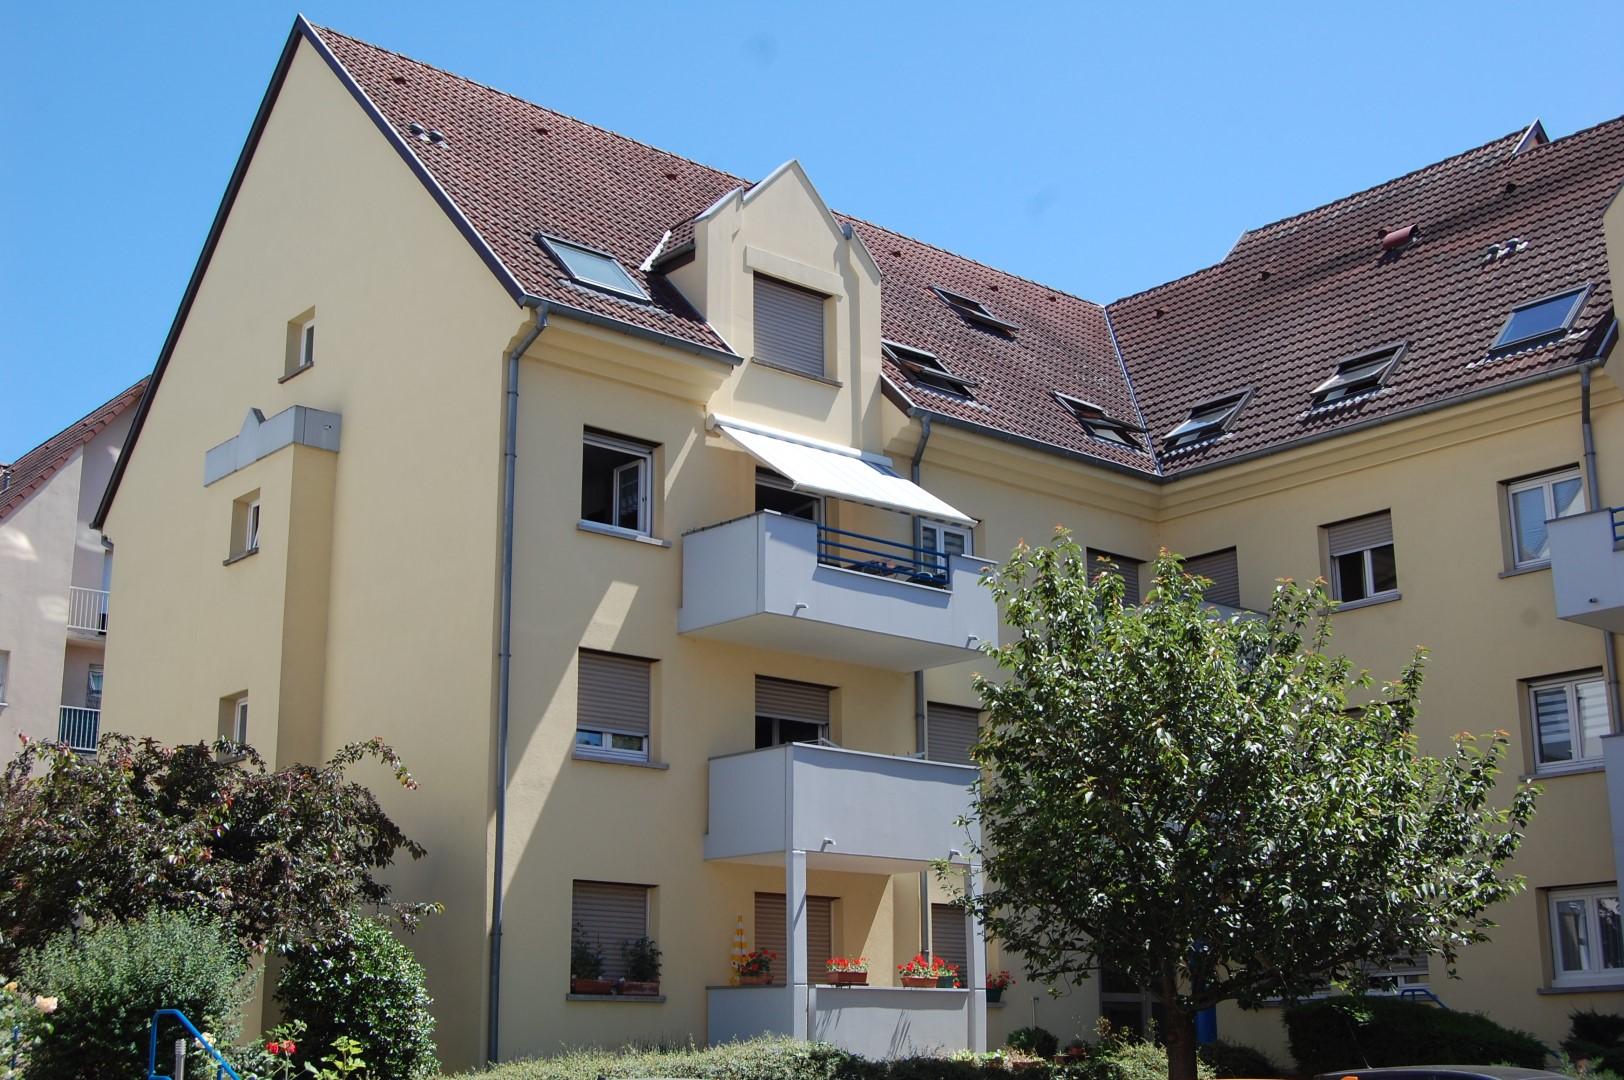 COLMAR Proche centre ville Beau F2-F3 de 76 m²